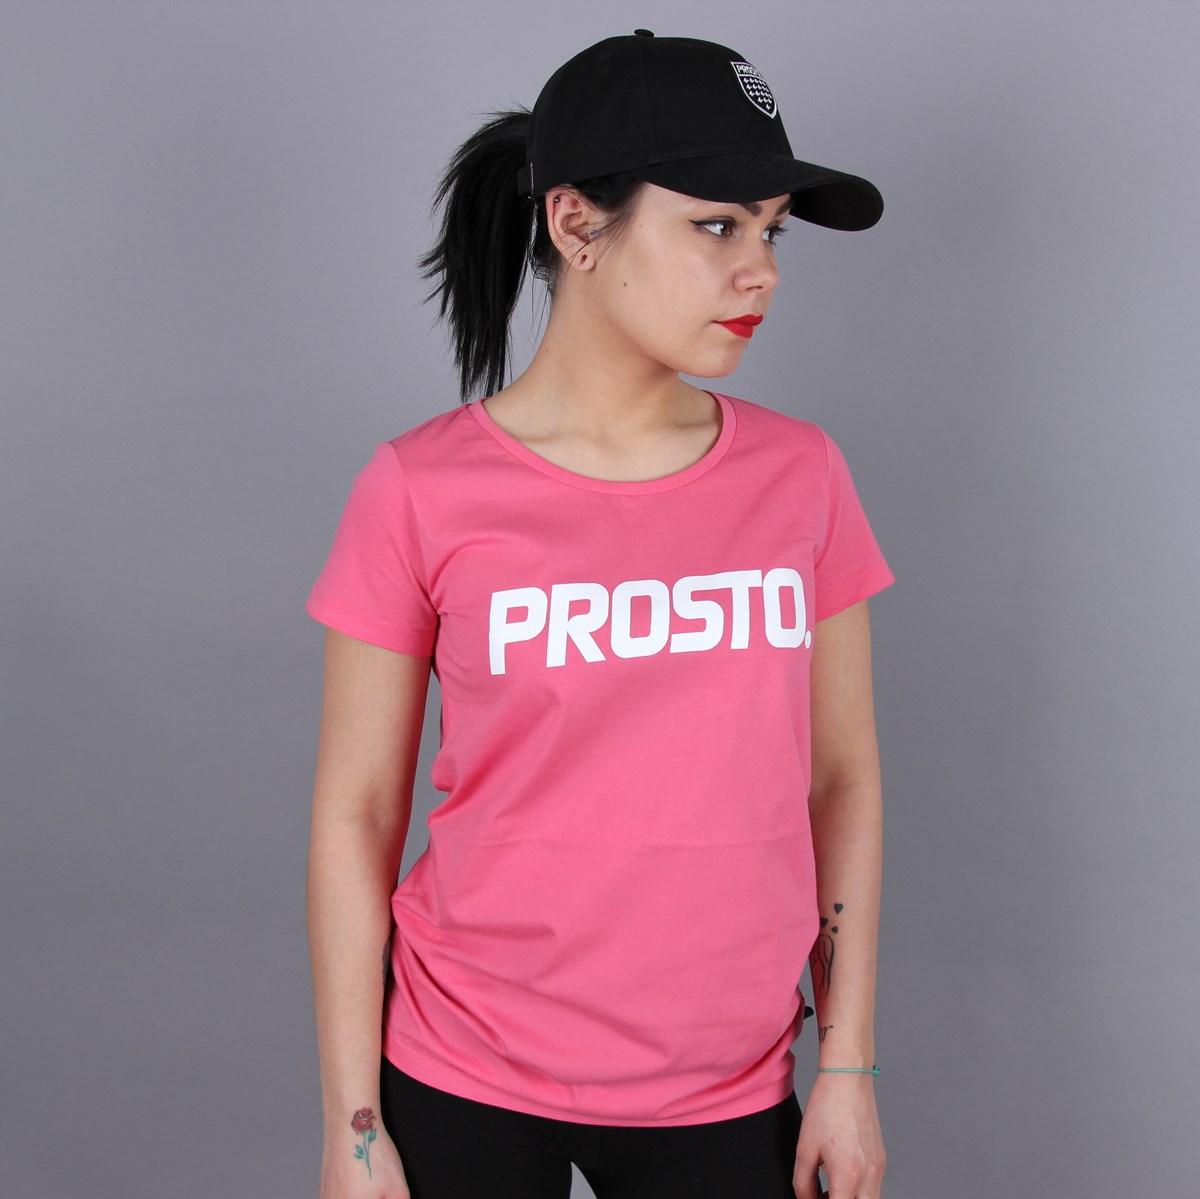 f8a59da0e Prosto Koszulka Damska Classic Pink | Sklep Braggashop.pl